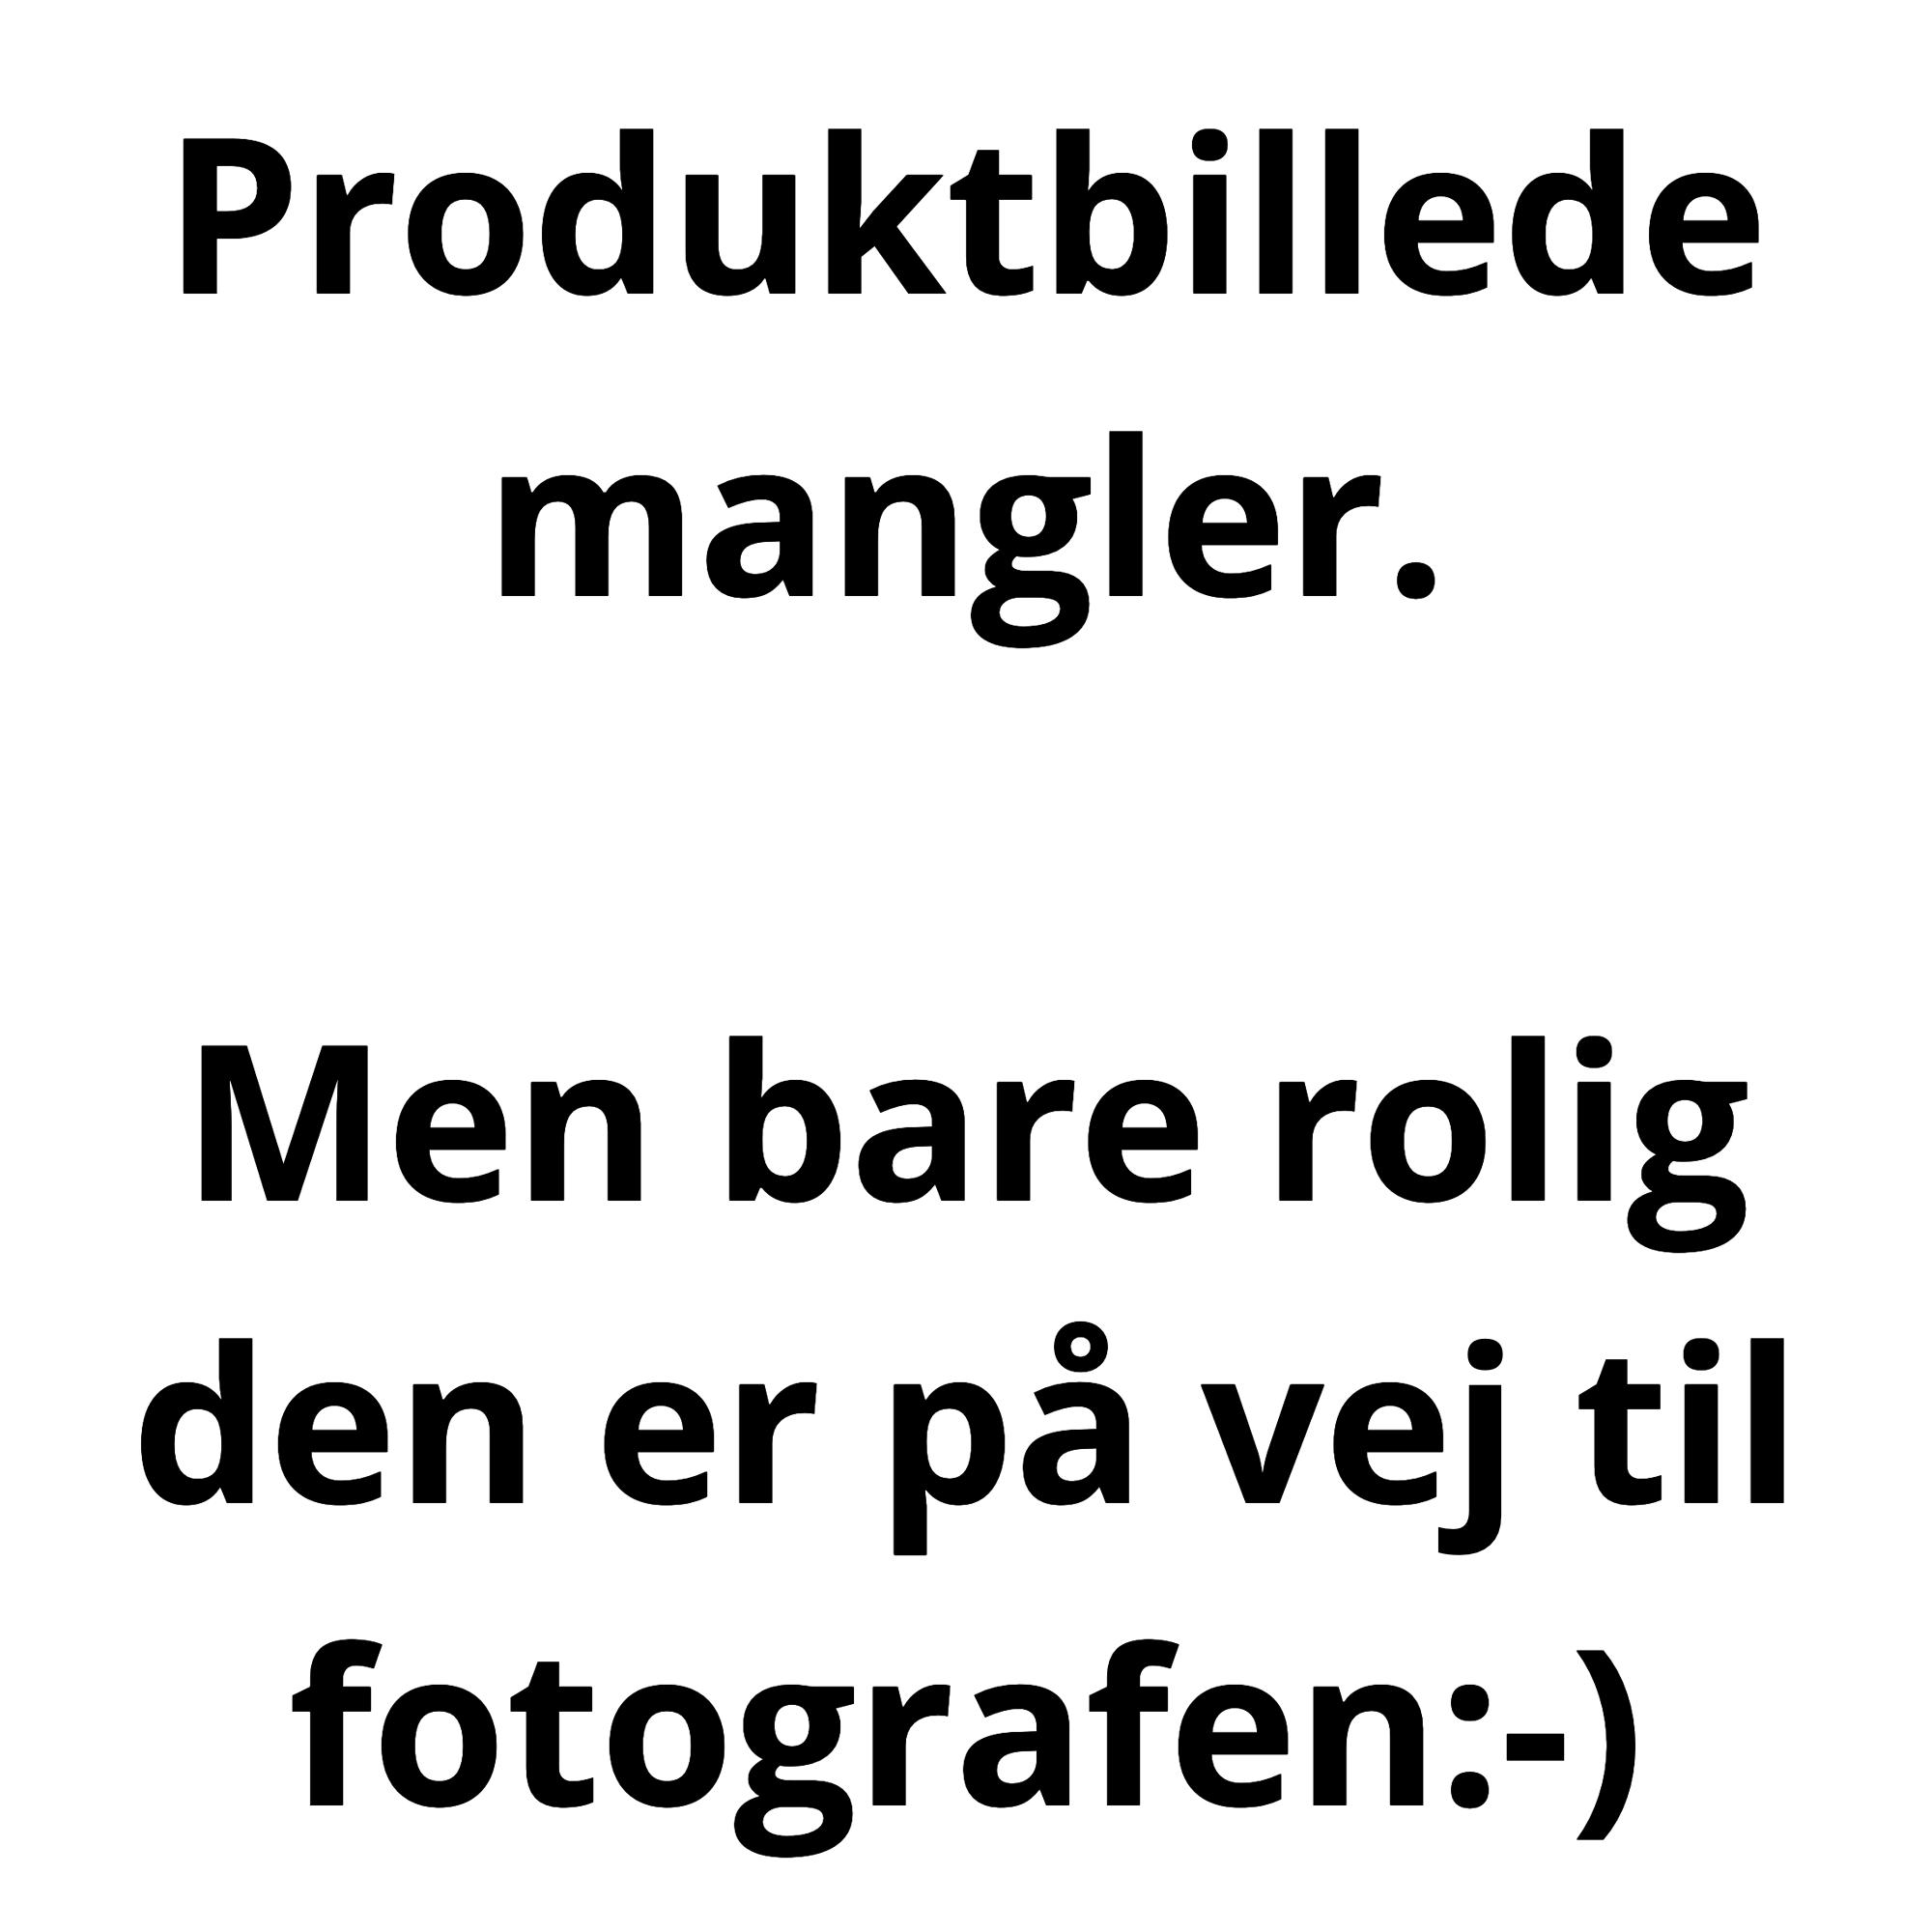 Iso adapter kabel til bla. Peugeot 407, Citroen C5/C4, 2004-